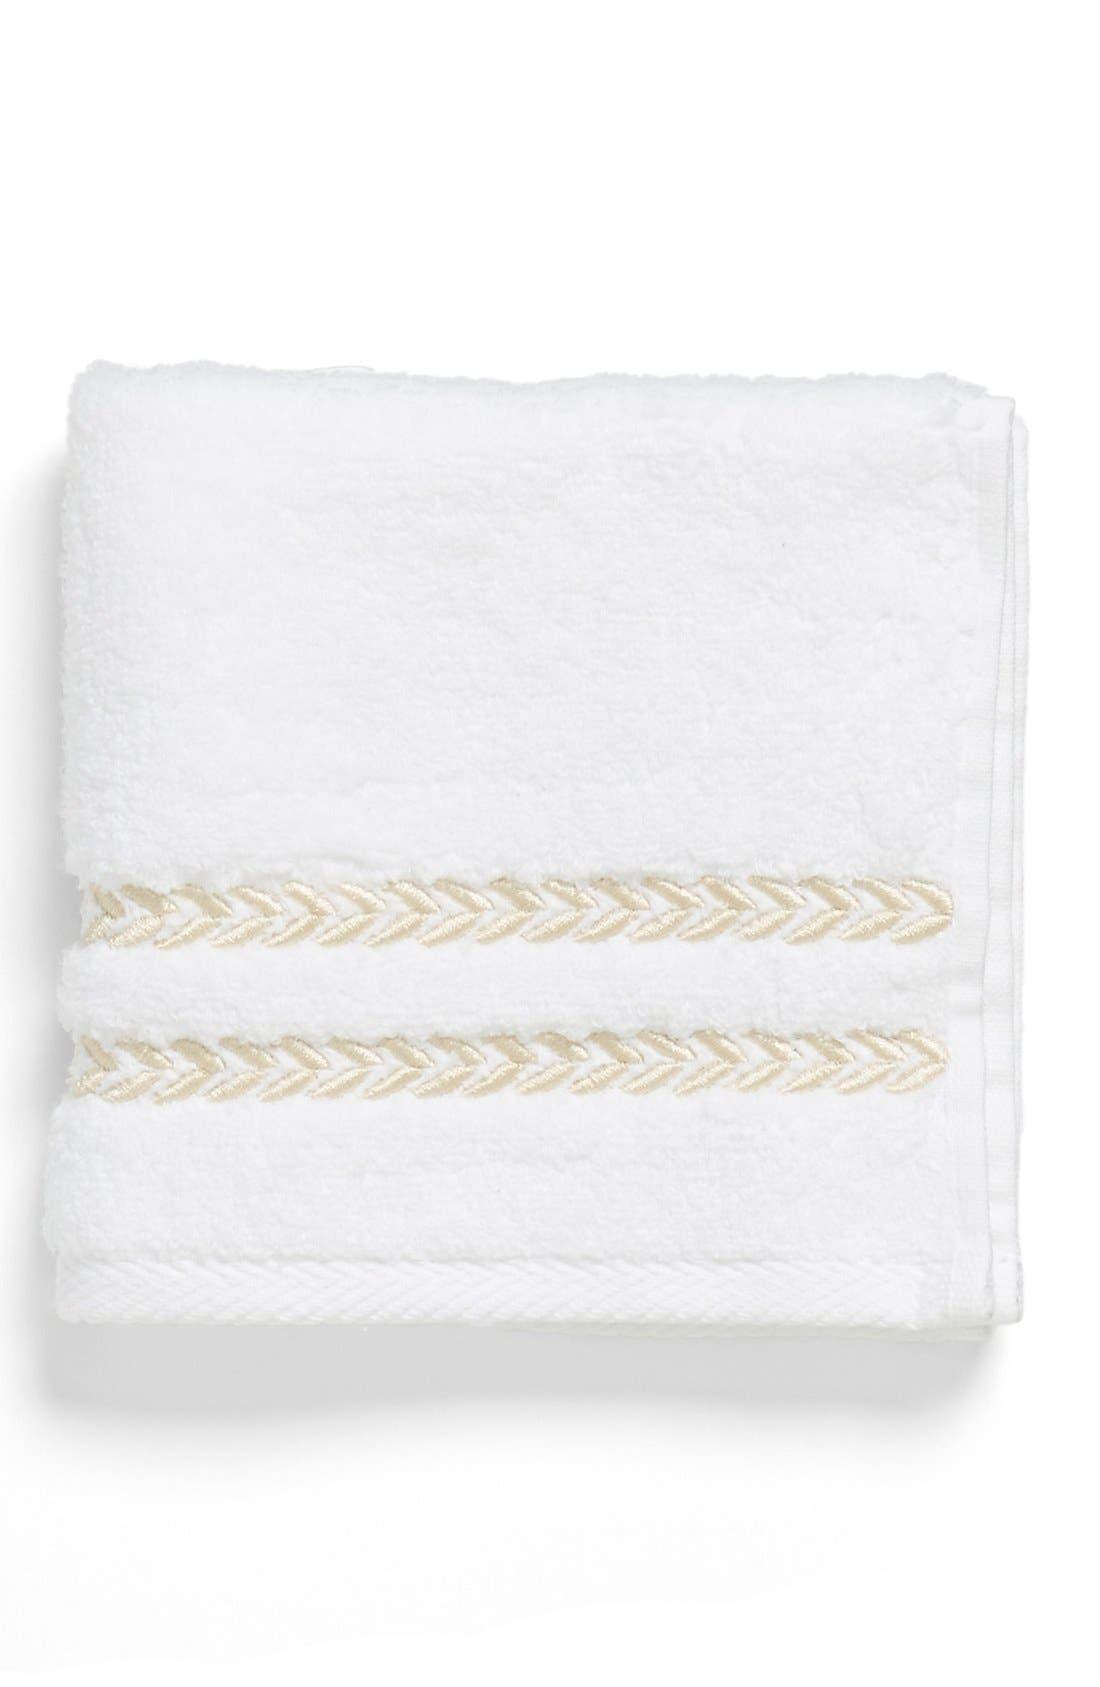 'Pearl Essence' Wash Towel,                             Main thumbnail 1, color,                             101